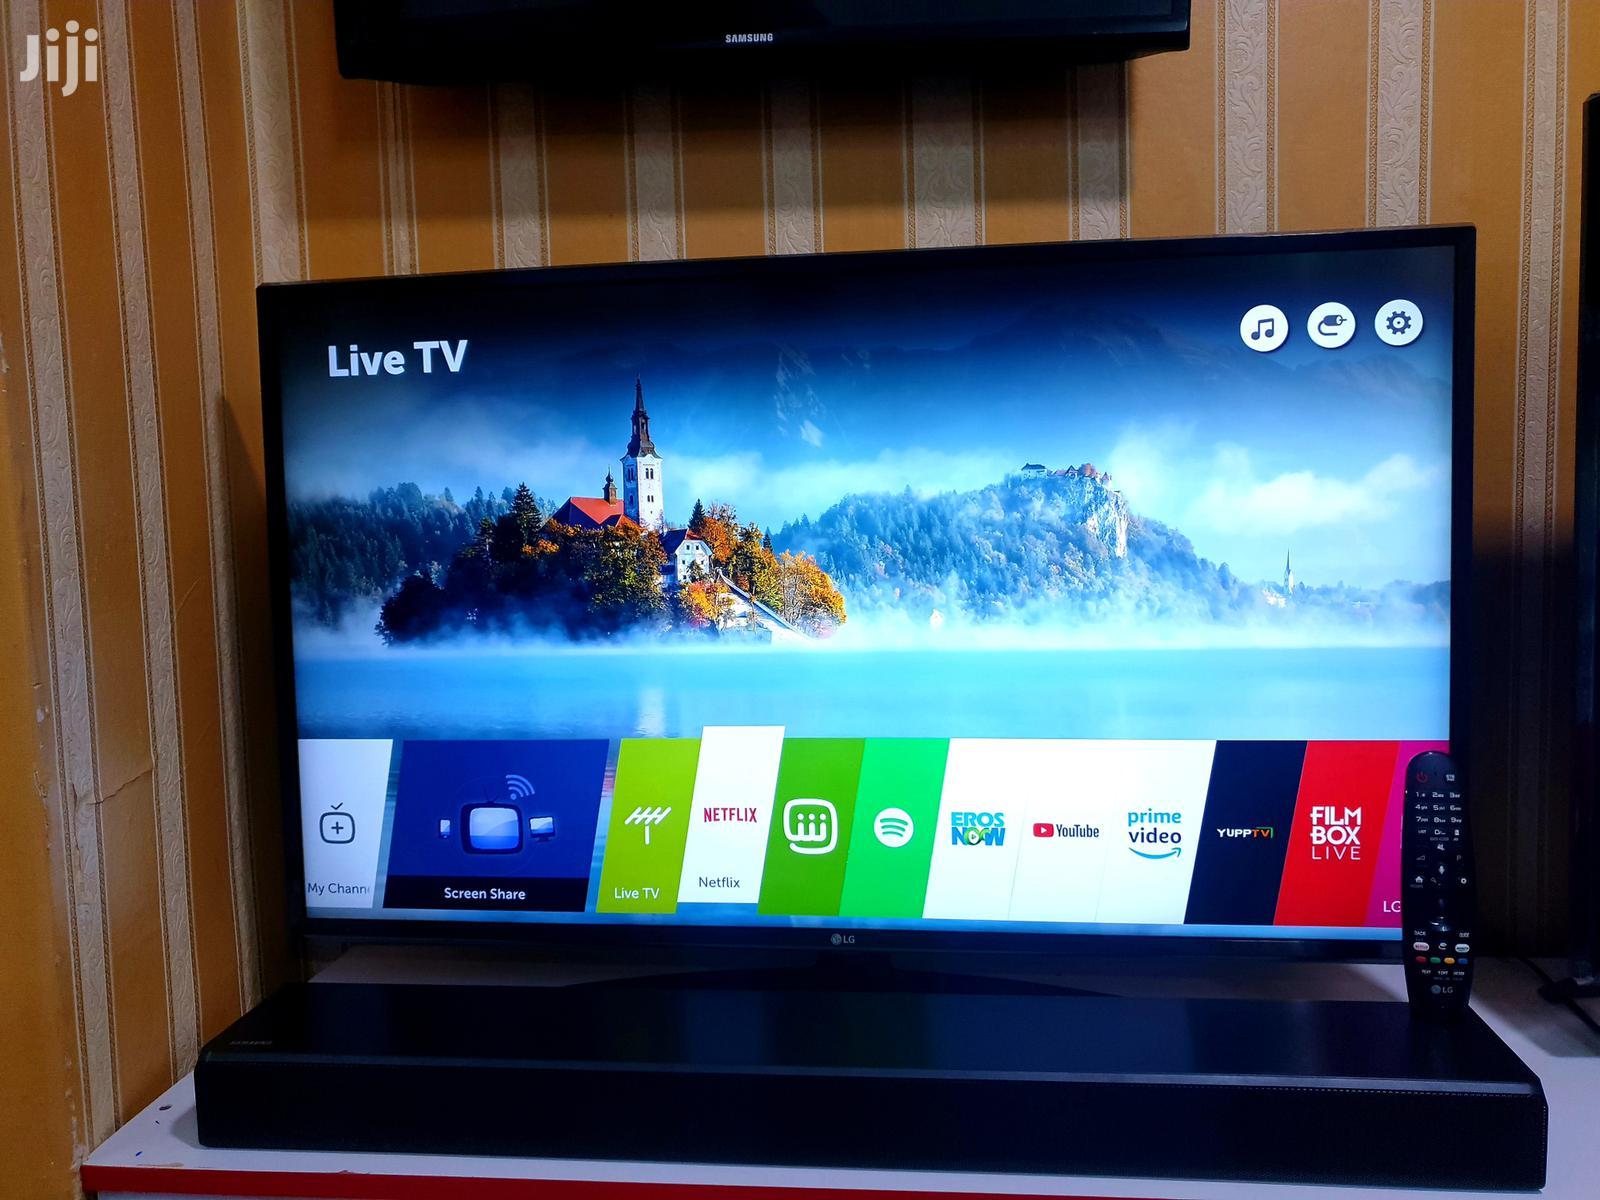 New LG 43 Inches Smart Ultra Hd 4k Webos Tv | TV & DVD Equipment for sale in Kampala, Central Region, Uganda